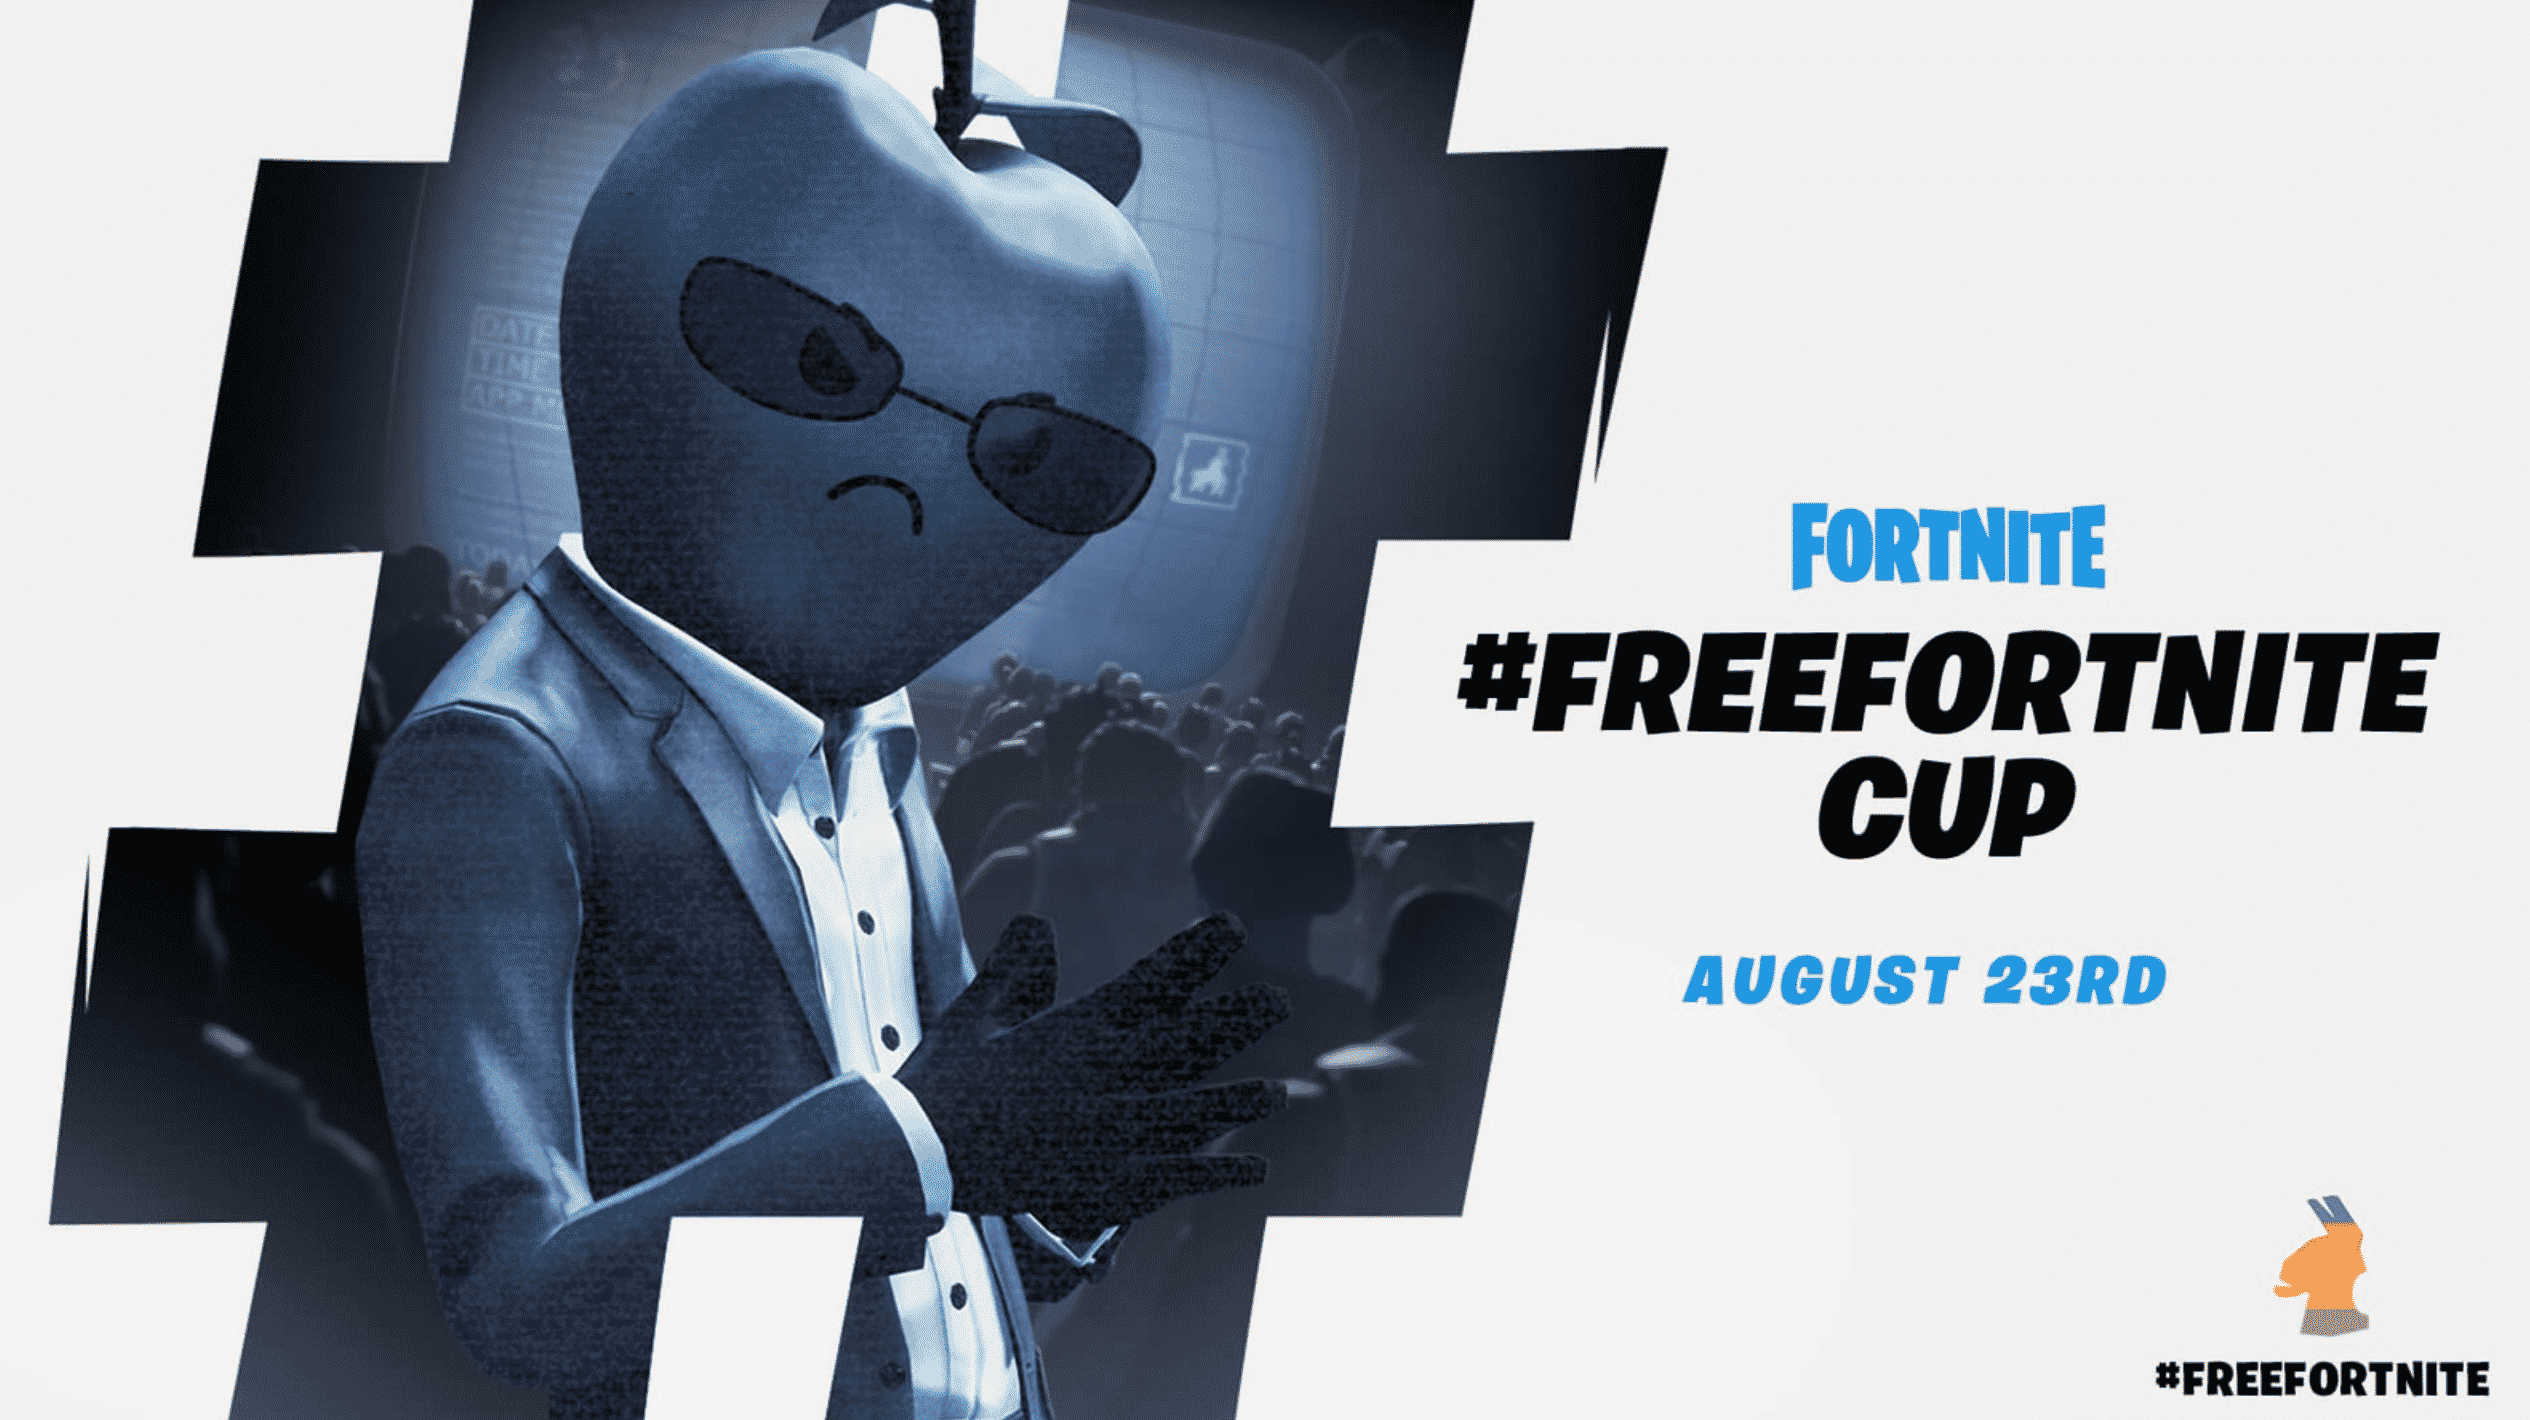 FreeFortnite Cup